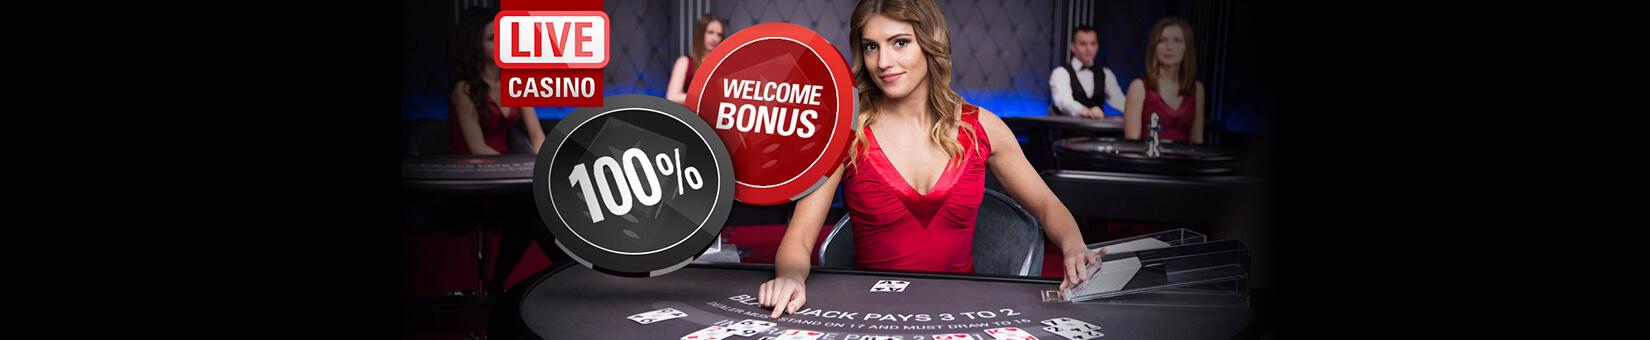 PokerStars Casino Bonus di Benvenuto